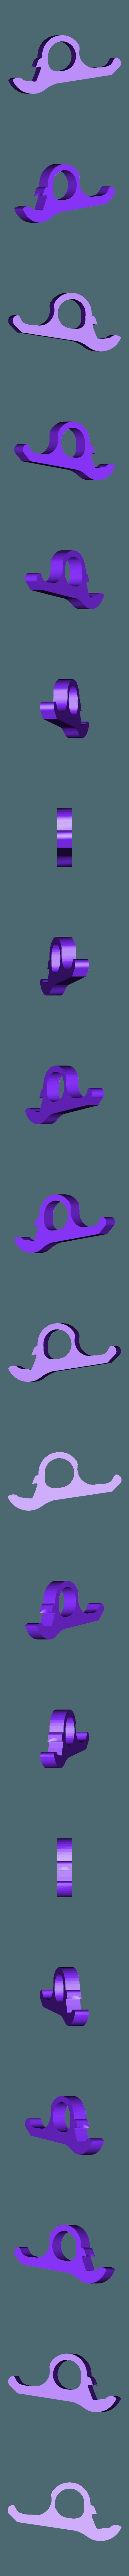 bottler.STL Download free STL file Fully Printable Bottle Opener • Model to 3D print, Nessun_Dorma